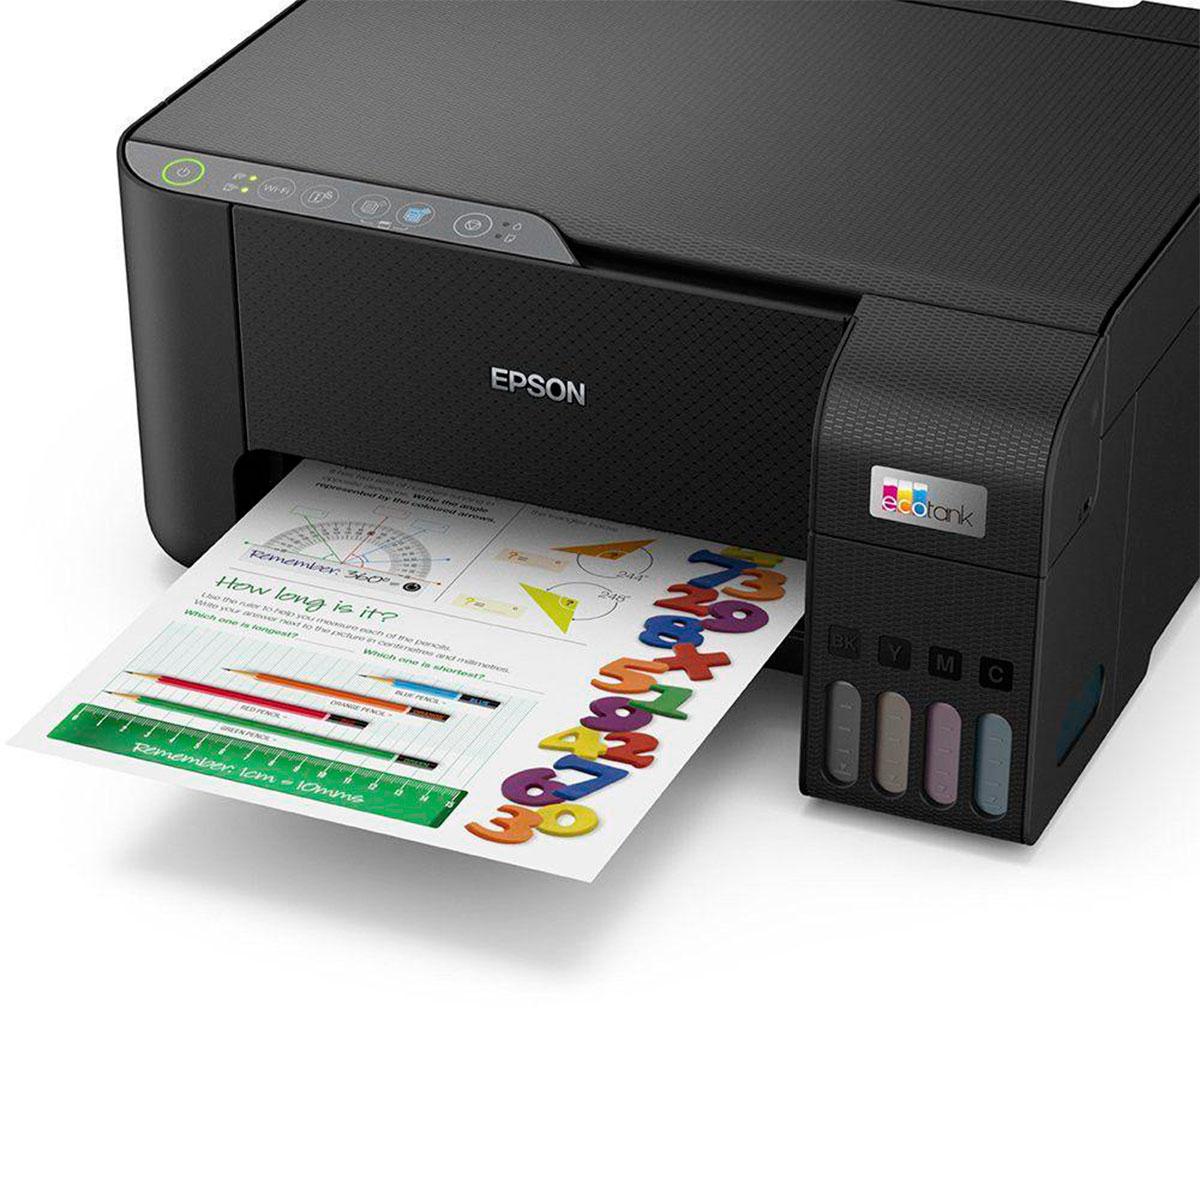 Impressora Multifuncional Epson EcoTank L3250, Colorida, Wi-Fi, USB 2.0, Bivolt - C11CJ67303